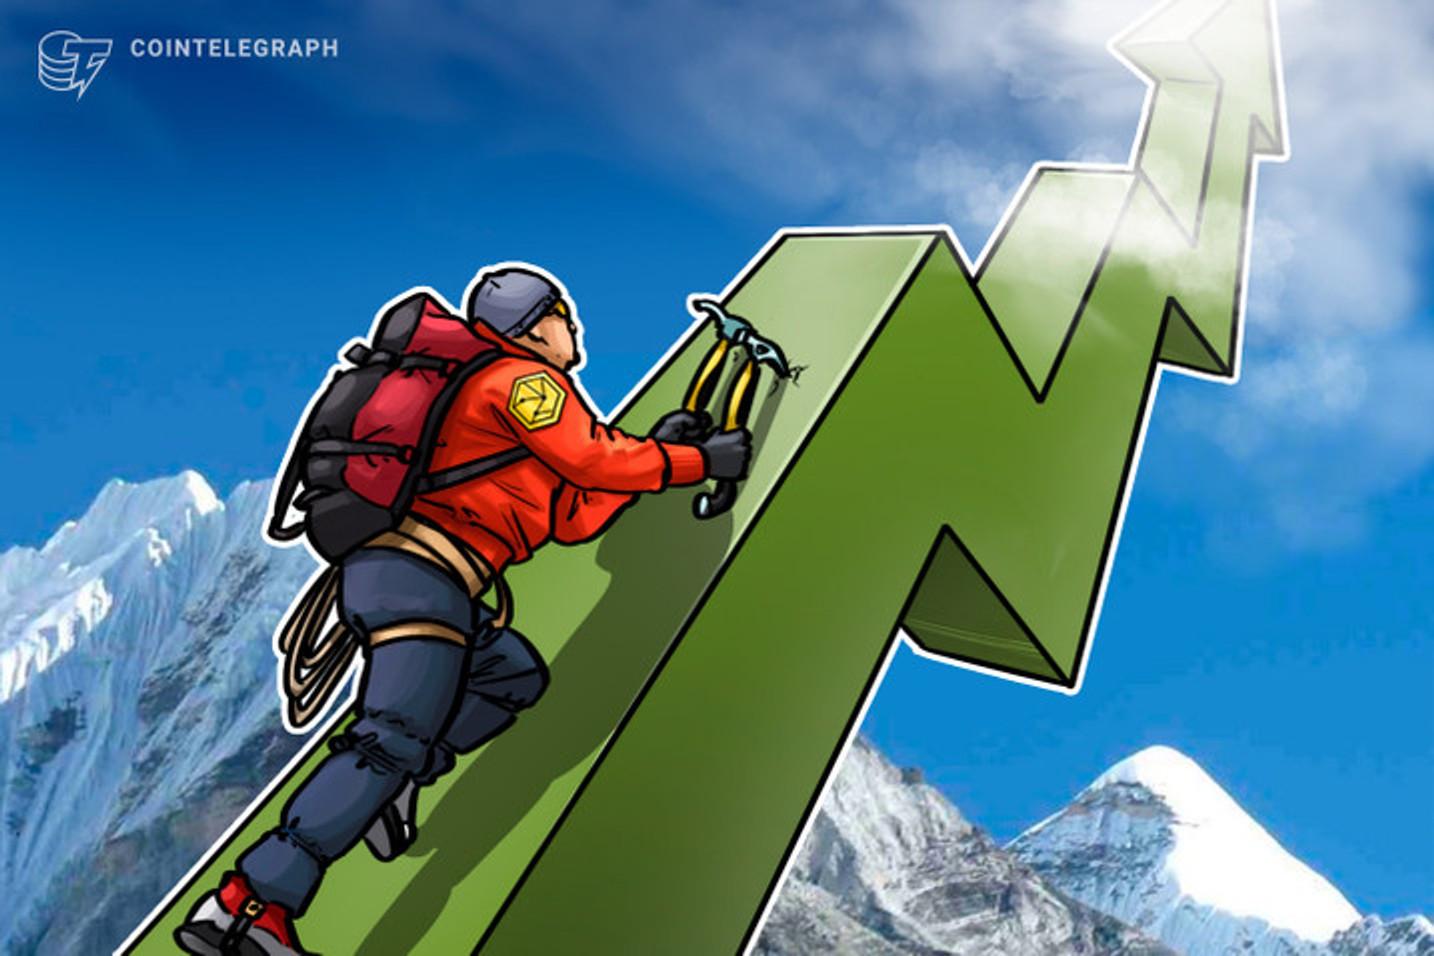 Indicadores sugerem que rali do Bitcoin ainda está por vir